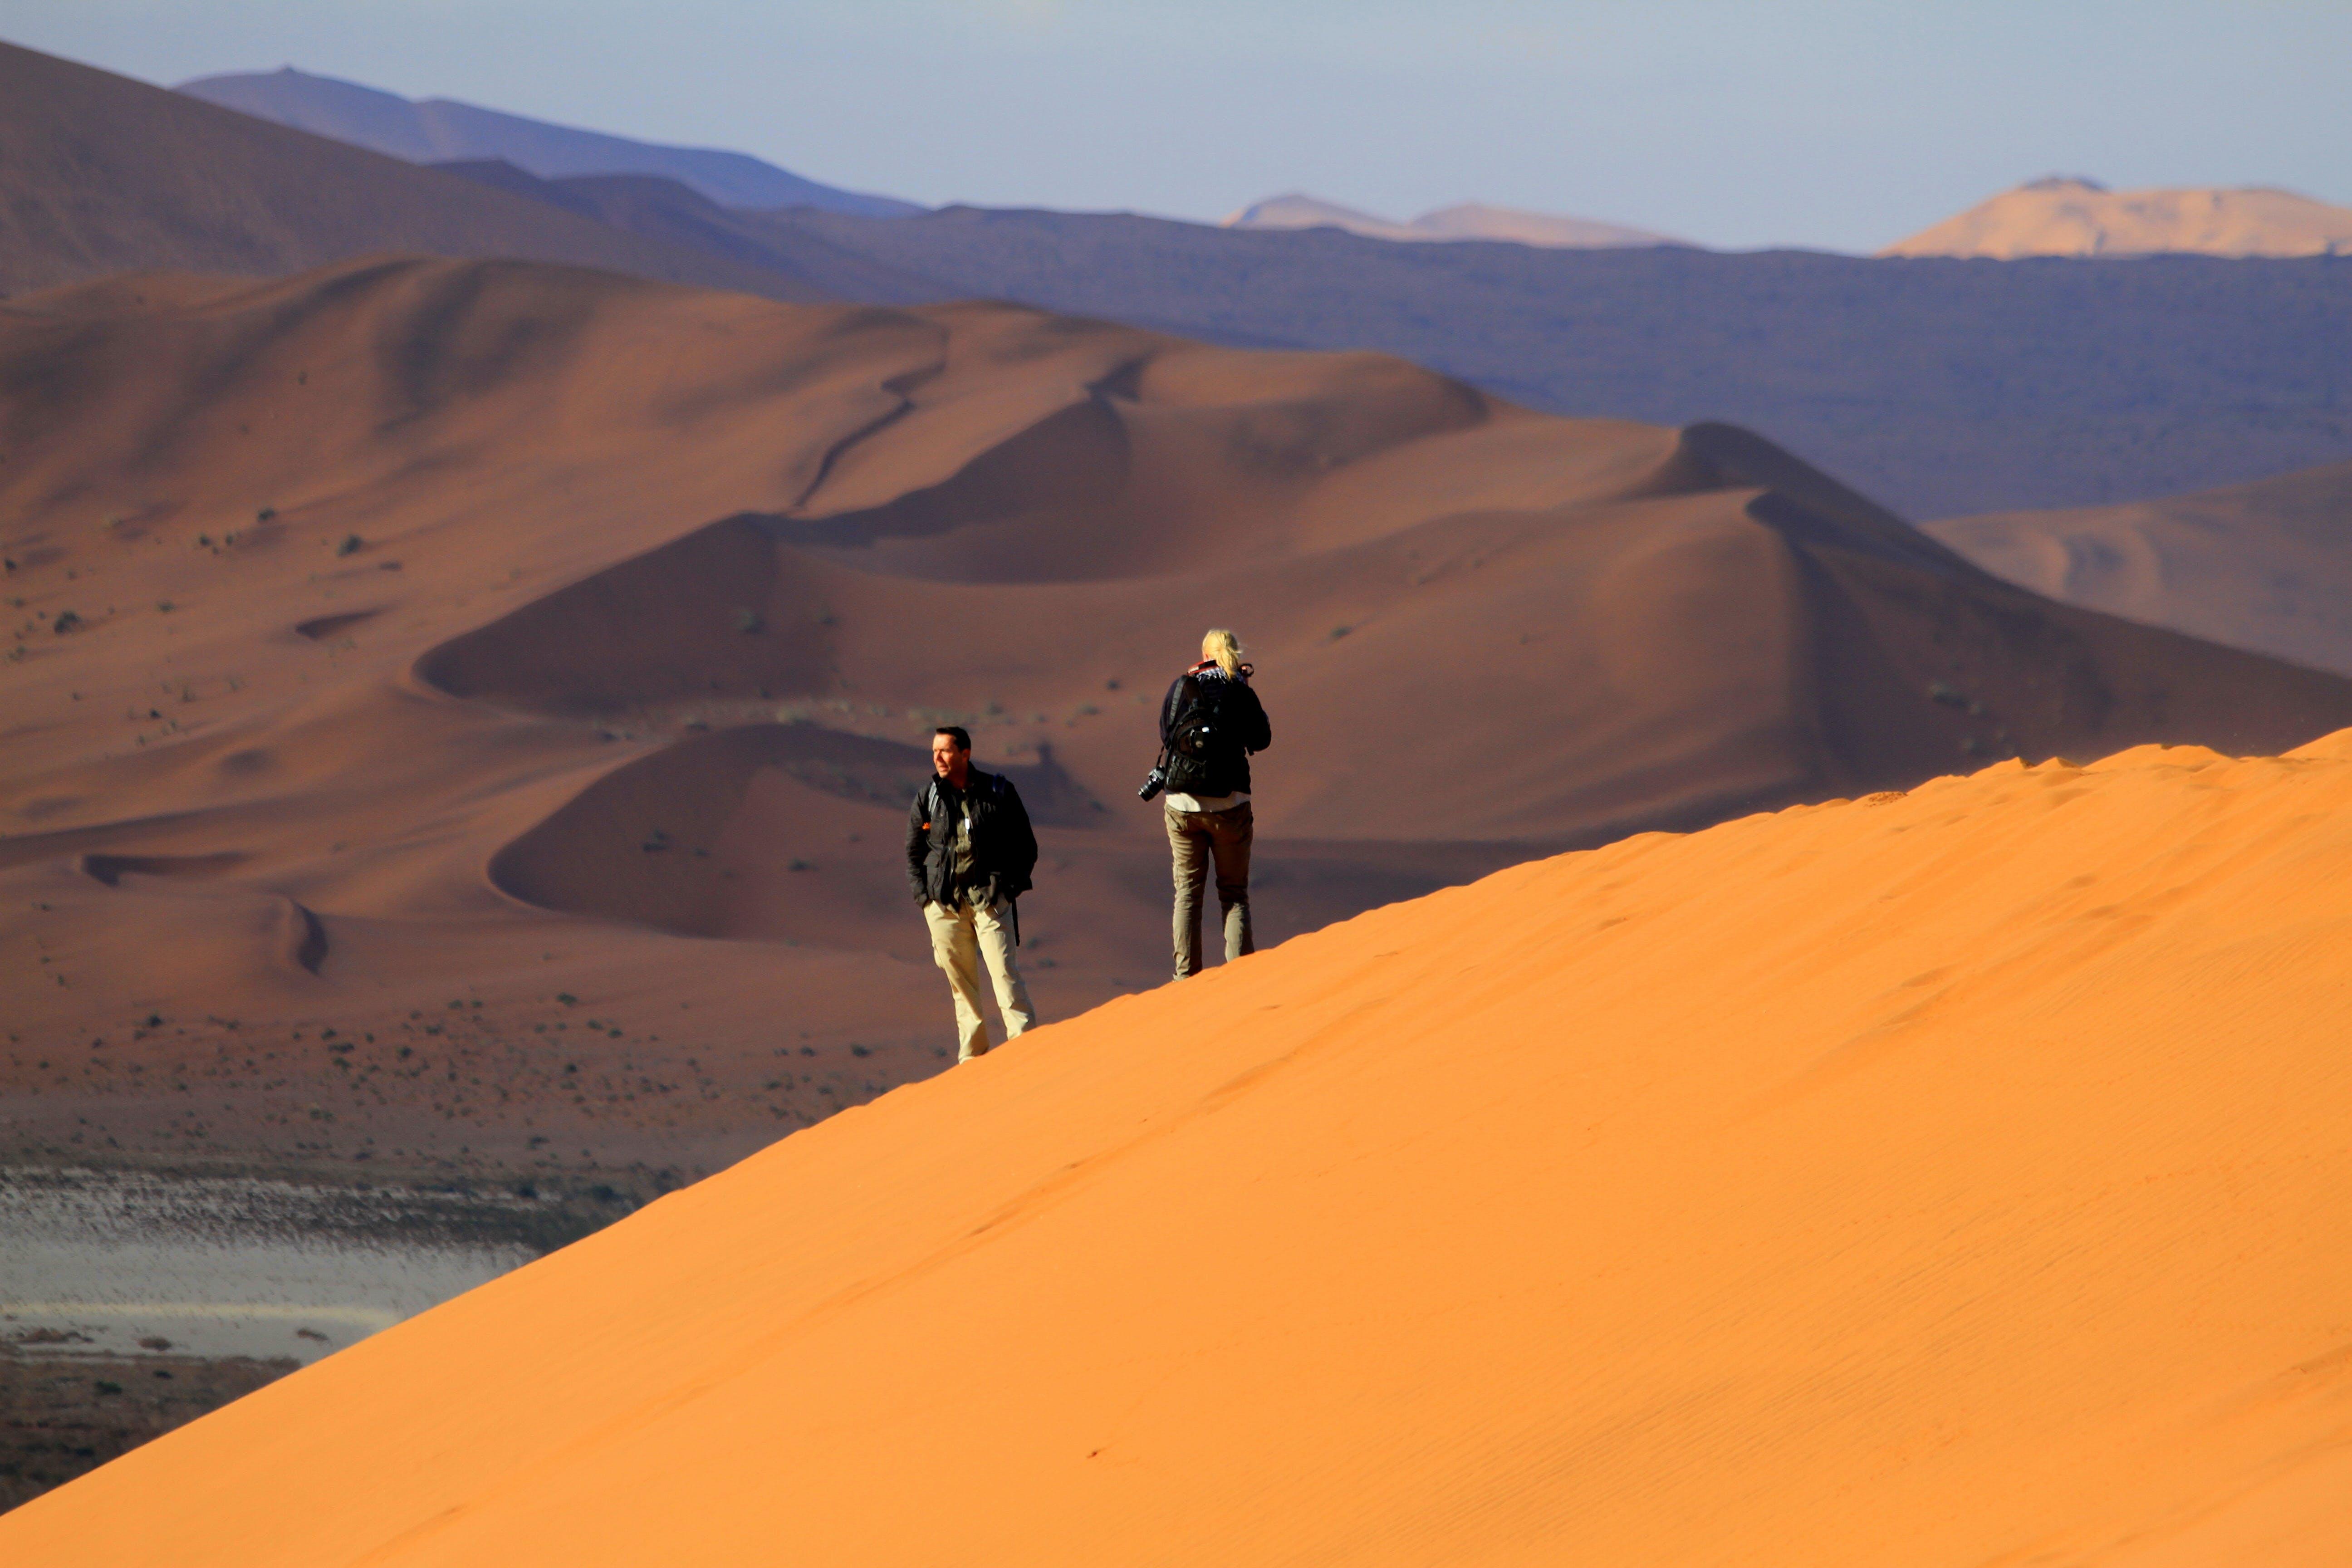 Kostenloses Stock Foto zu dünen, minimalismus, minimalist, namibia